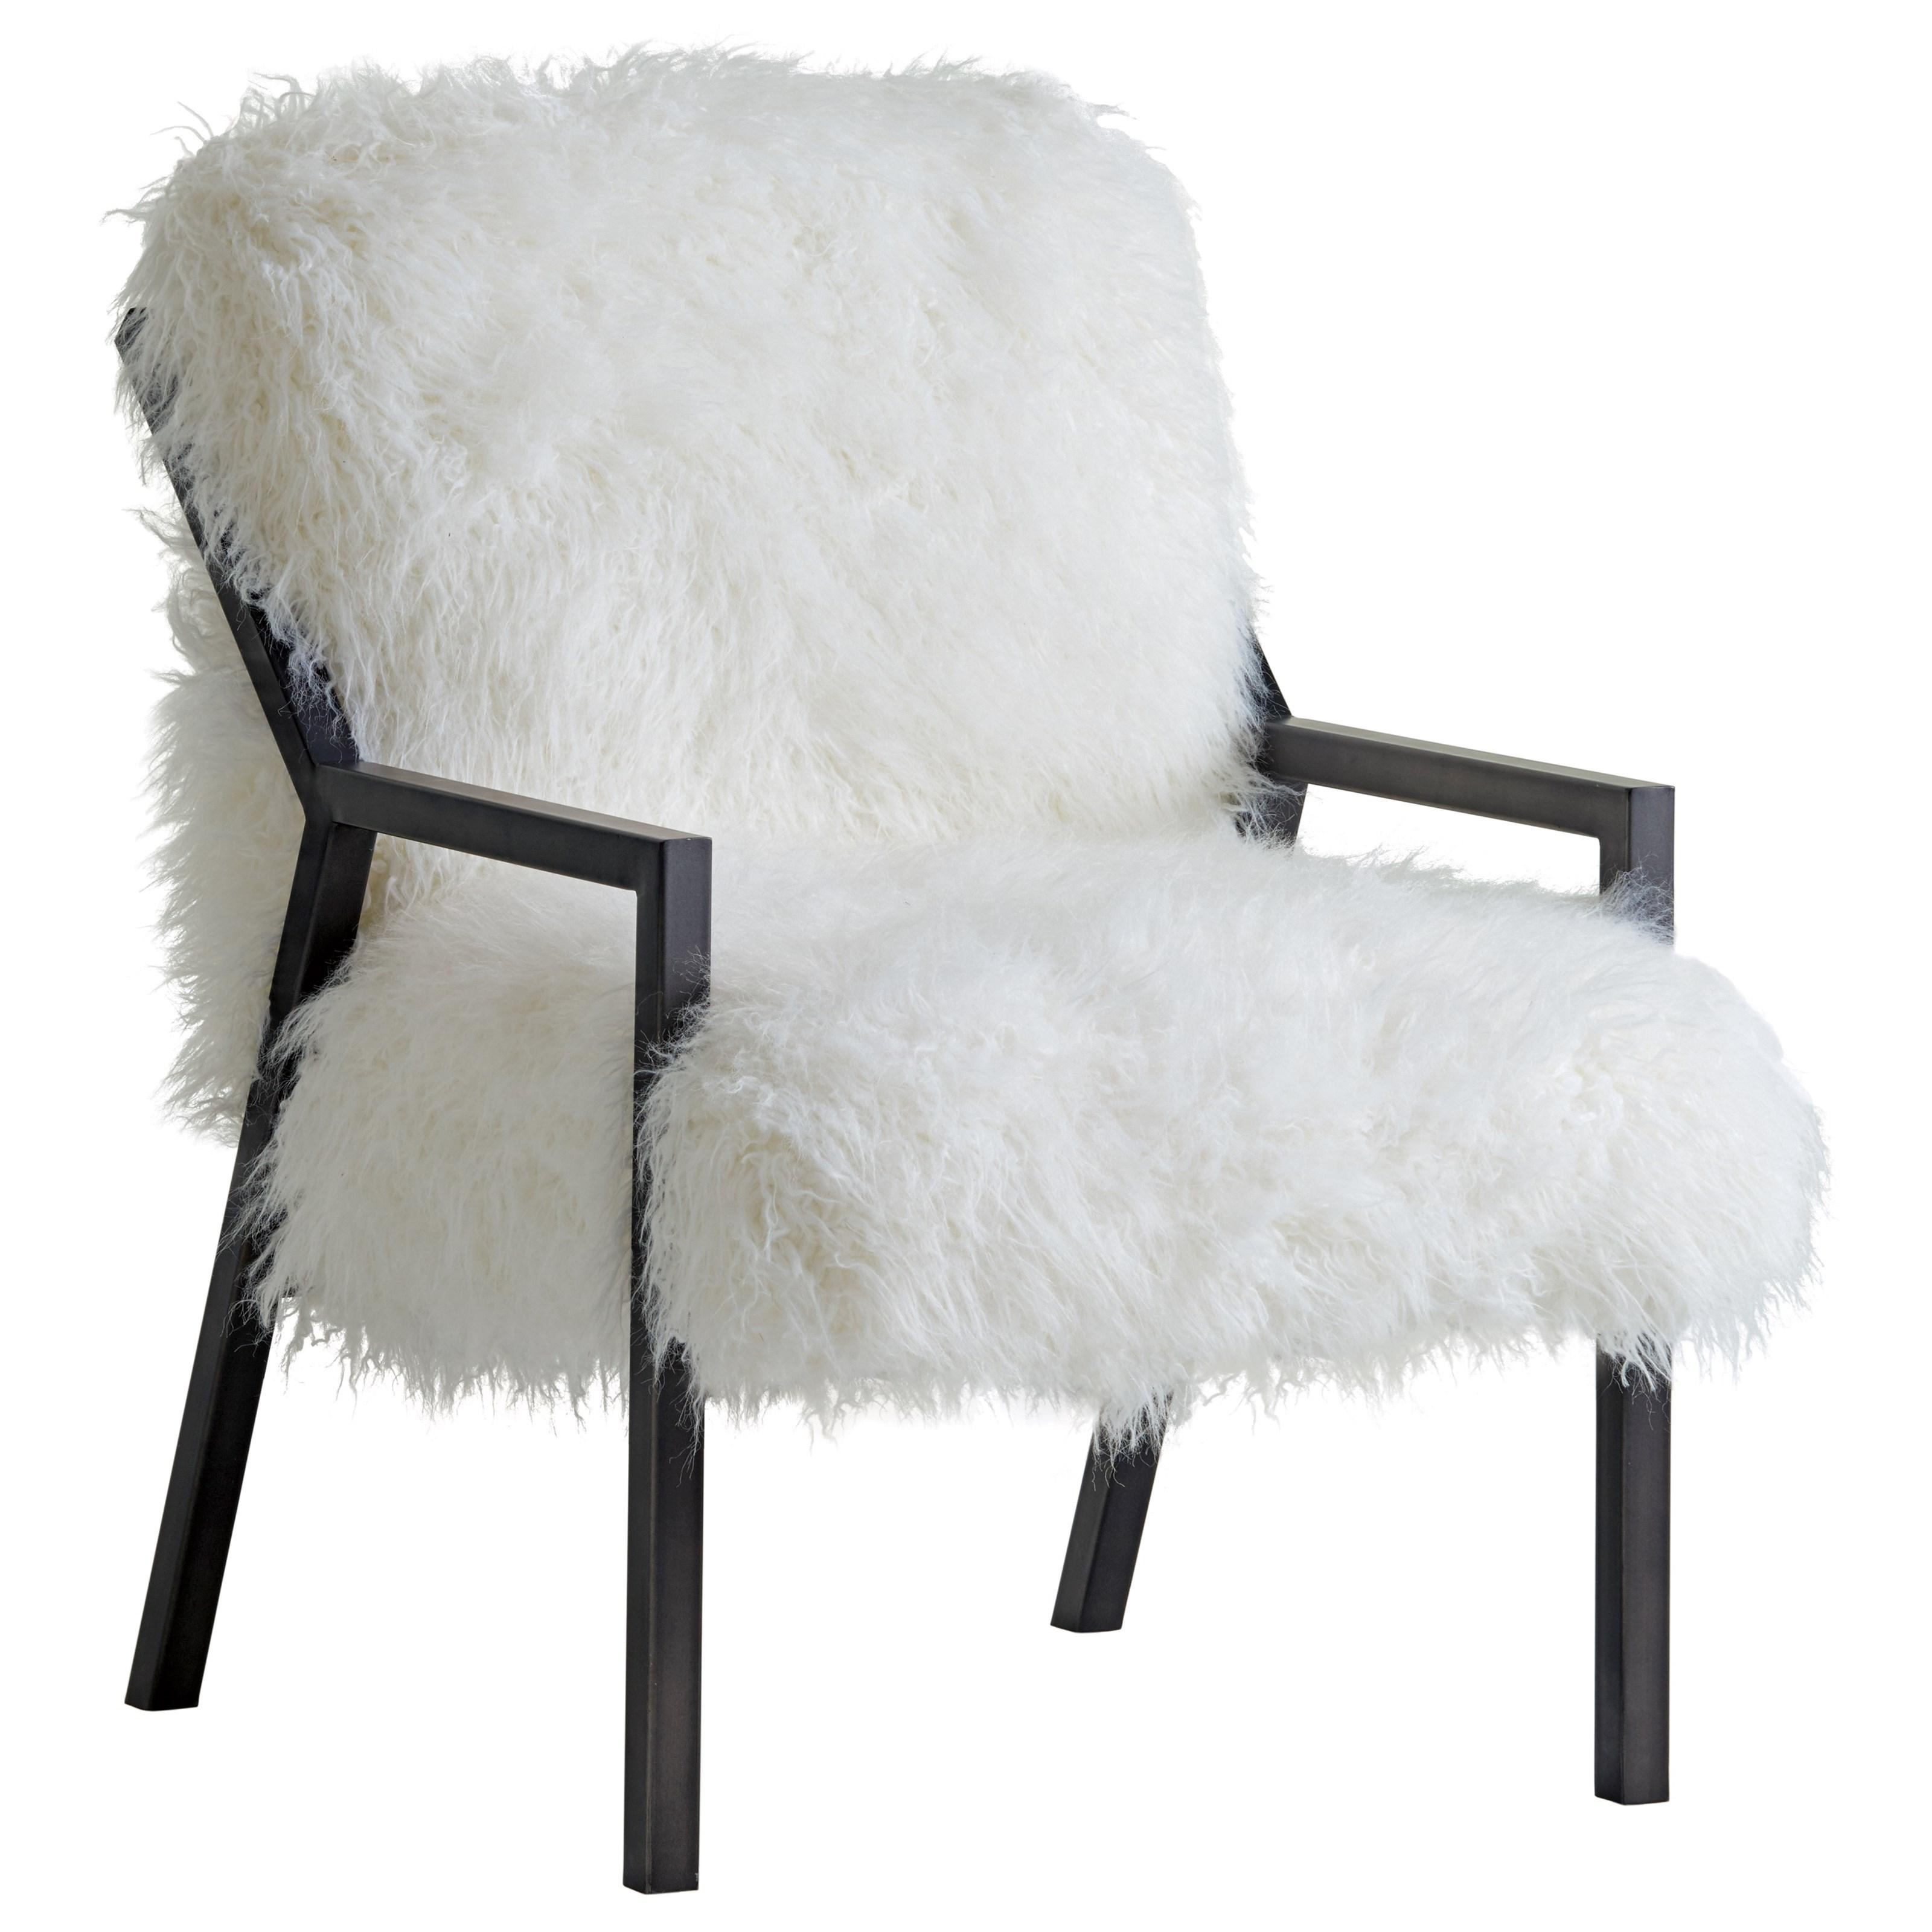 Santana Weldon Chair by Lexington at Baer's Furniture